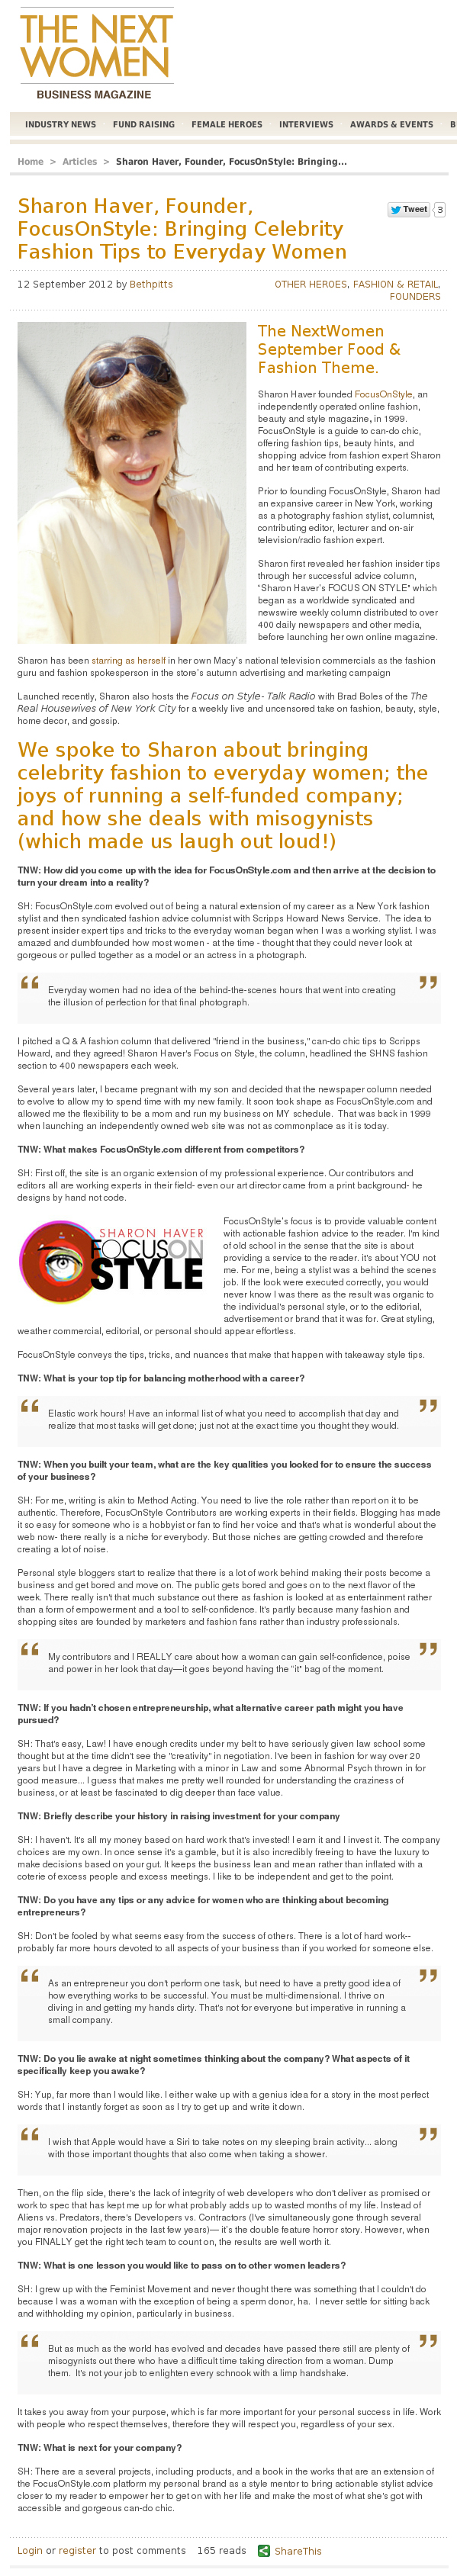 Sharon Haver interview on The Next Women business magazine